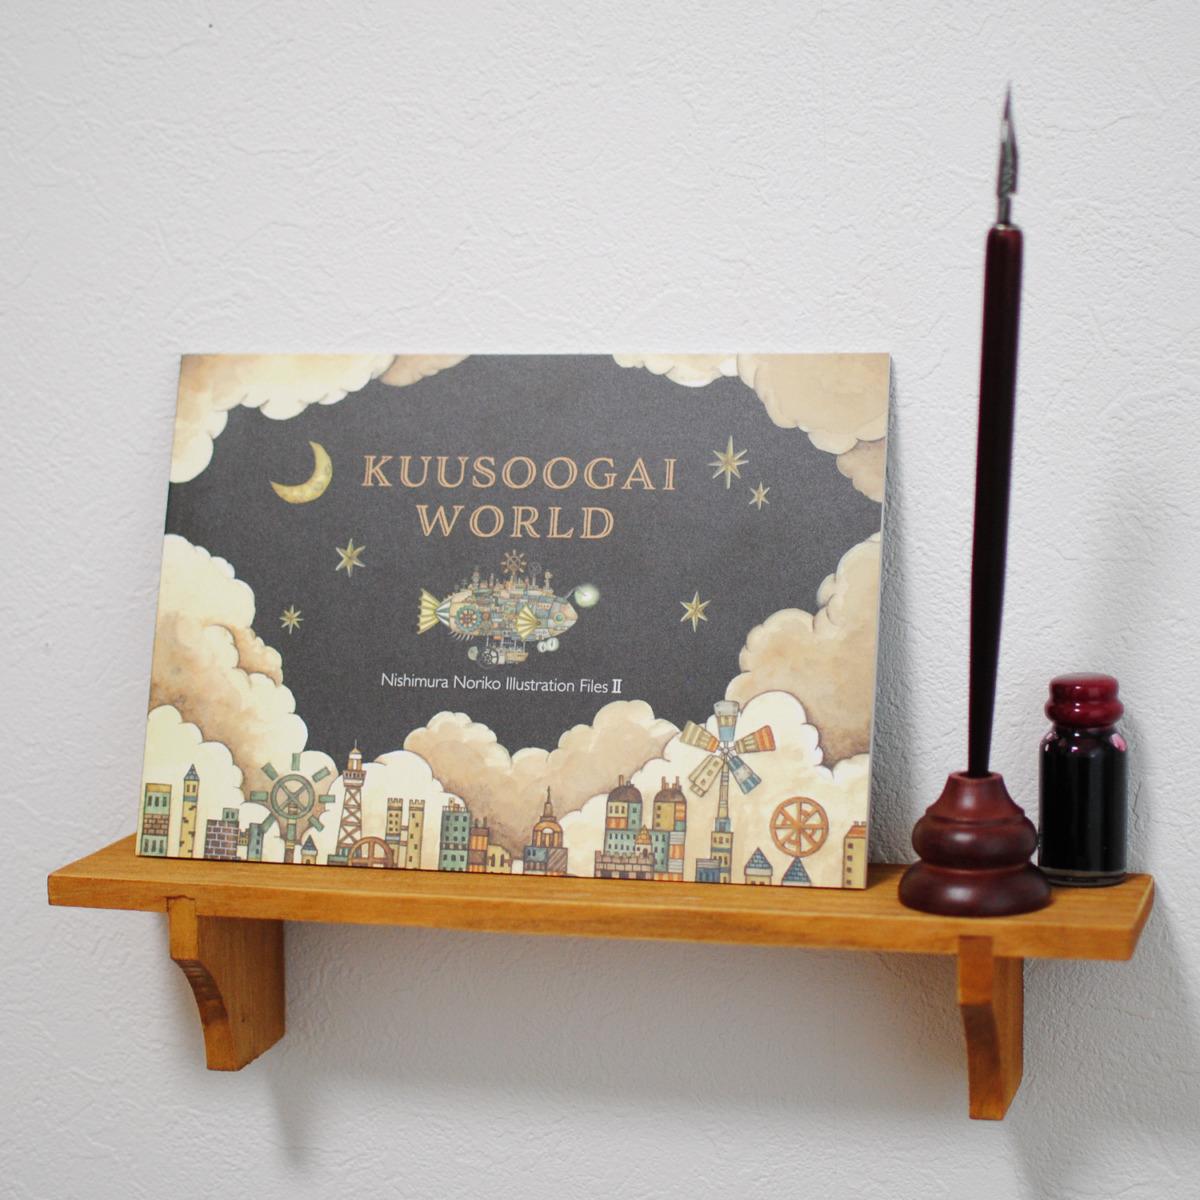 空想街作品集Ⅱ「Kuusoogai World」